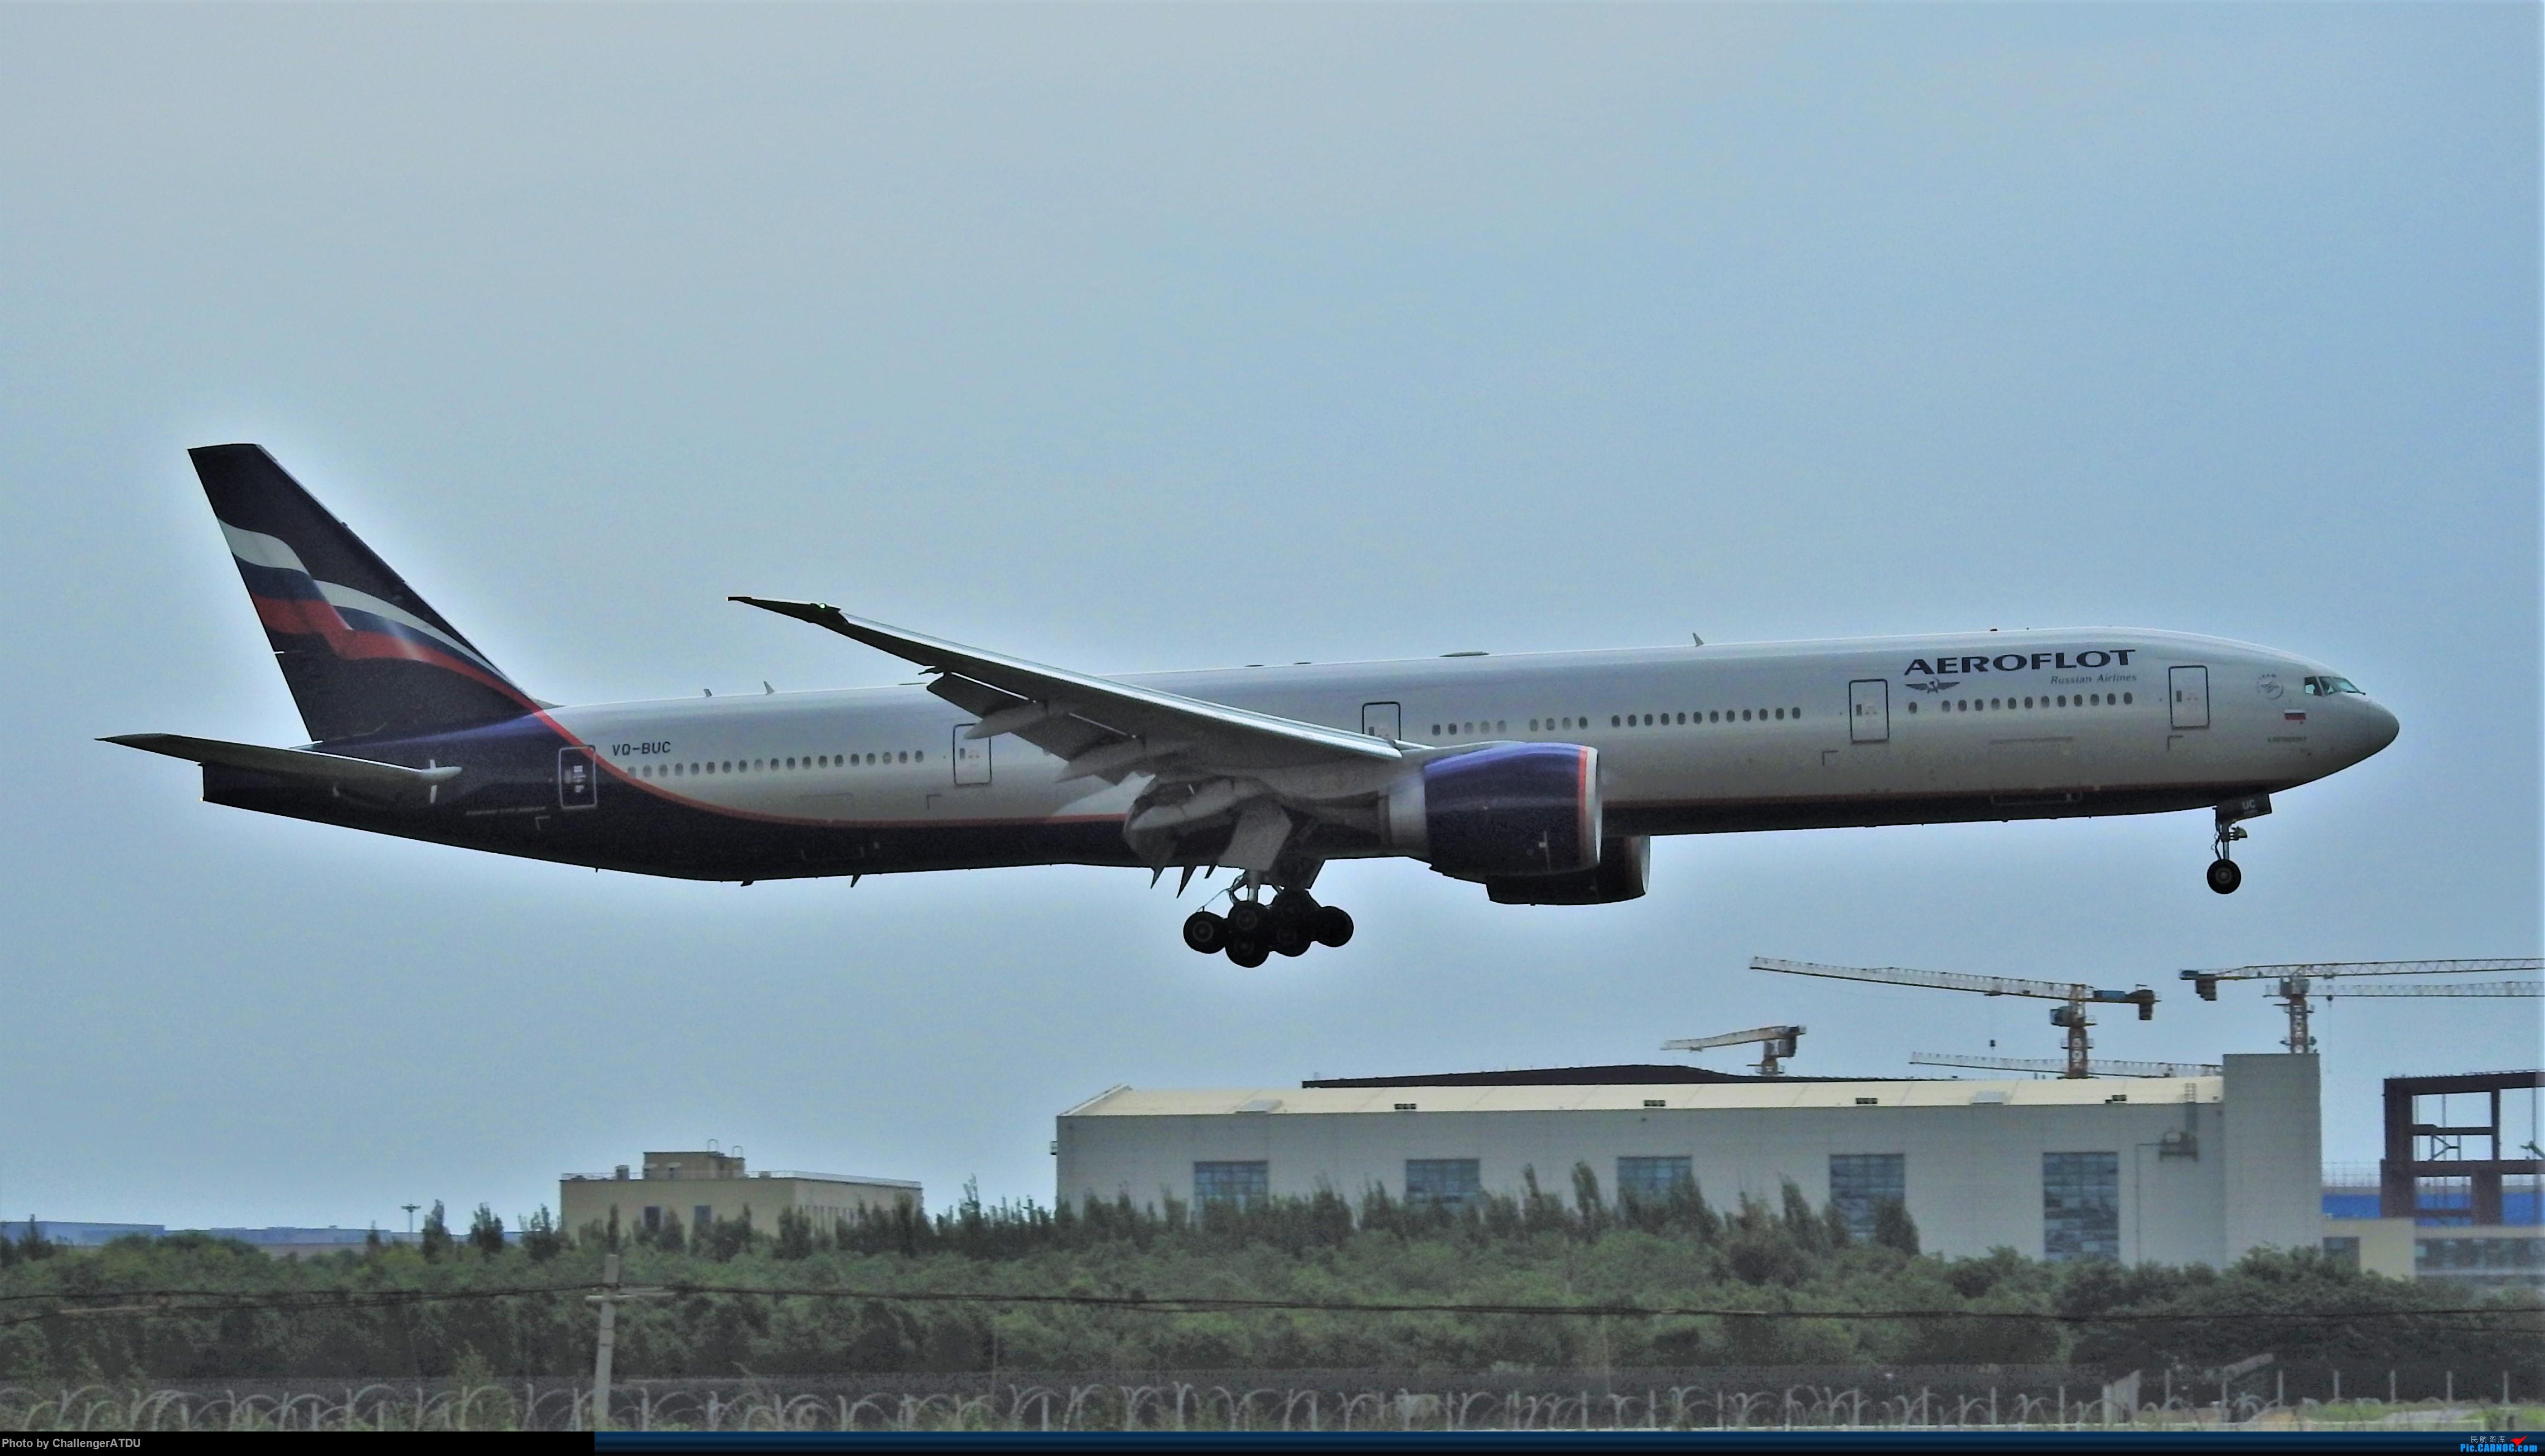 Re:[原创]2020-5-30 萌新のPEK之旅 BOEING 777-300ER VQ-BUC 北京首都国际机场